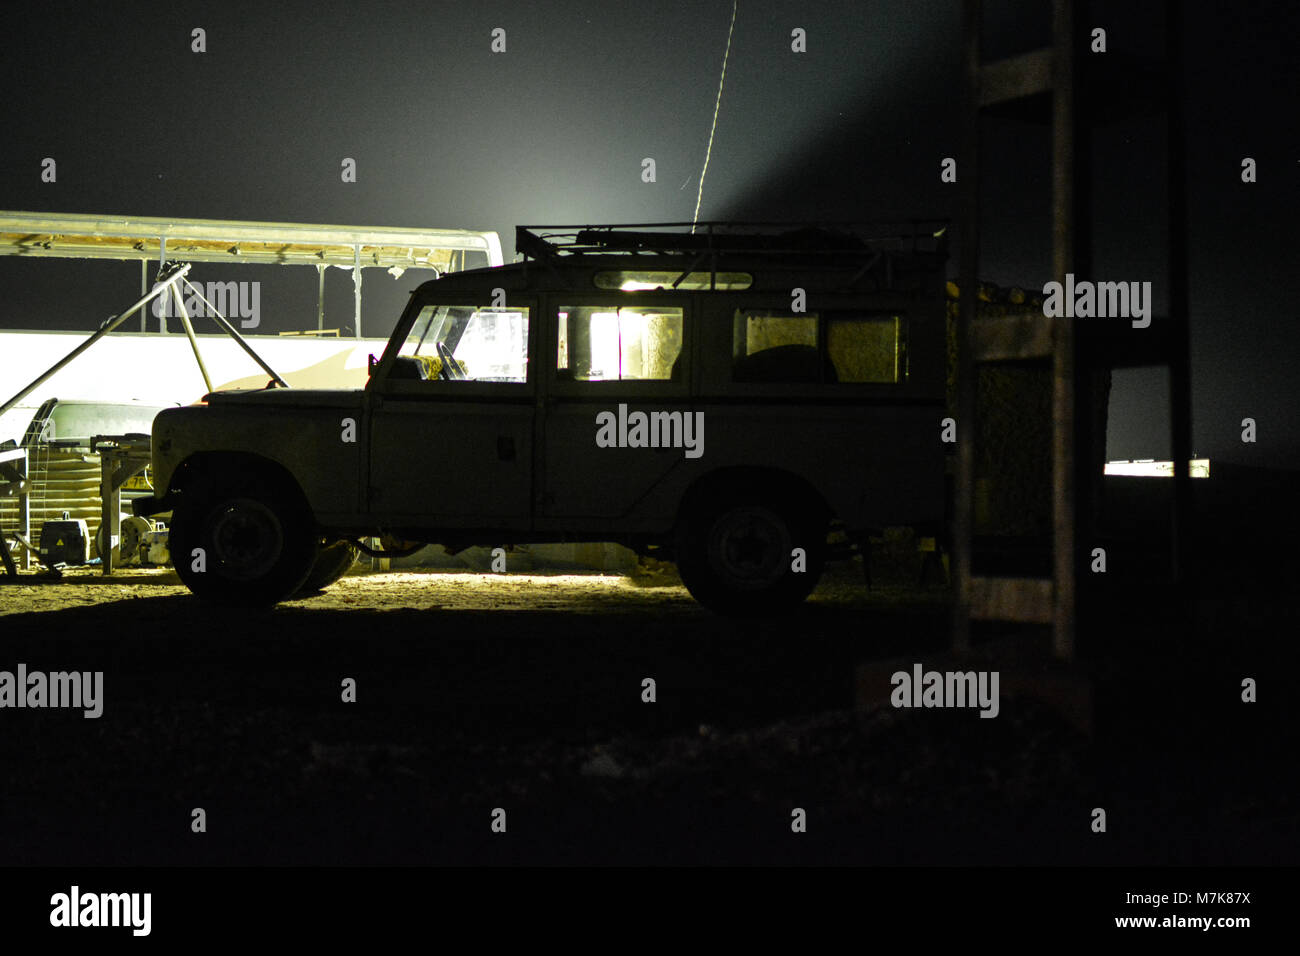 Land Rover 4x4 vehicles in Smara Saharawi refugee camp. - Stock Image